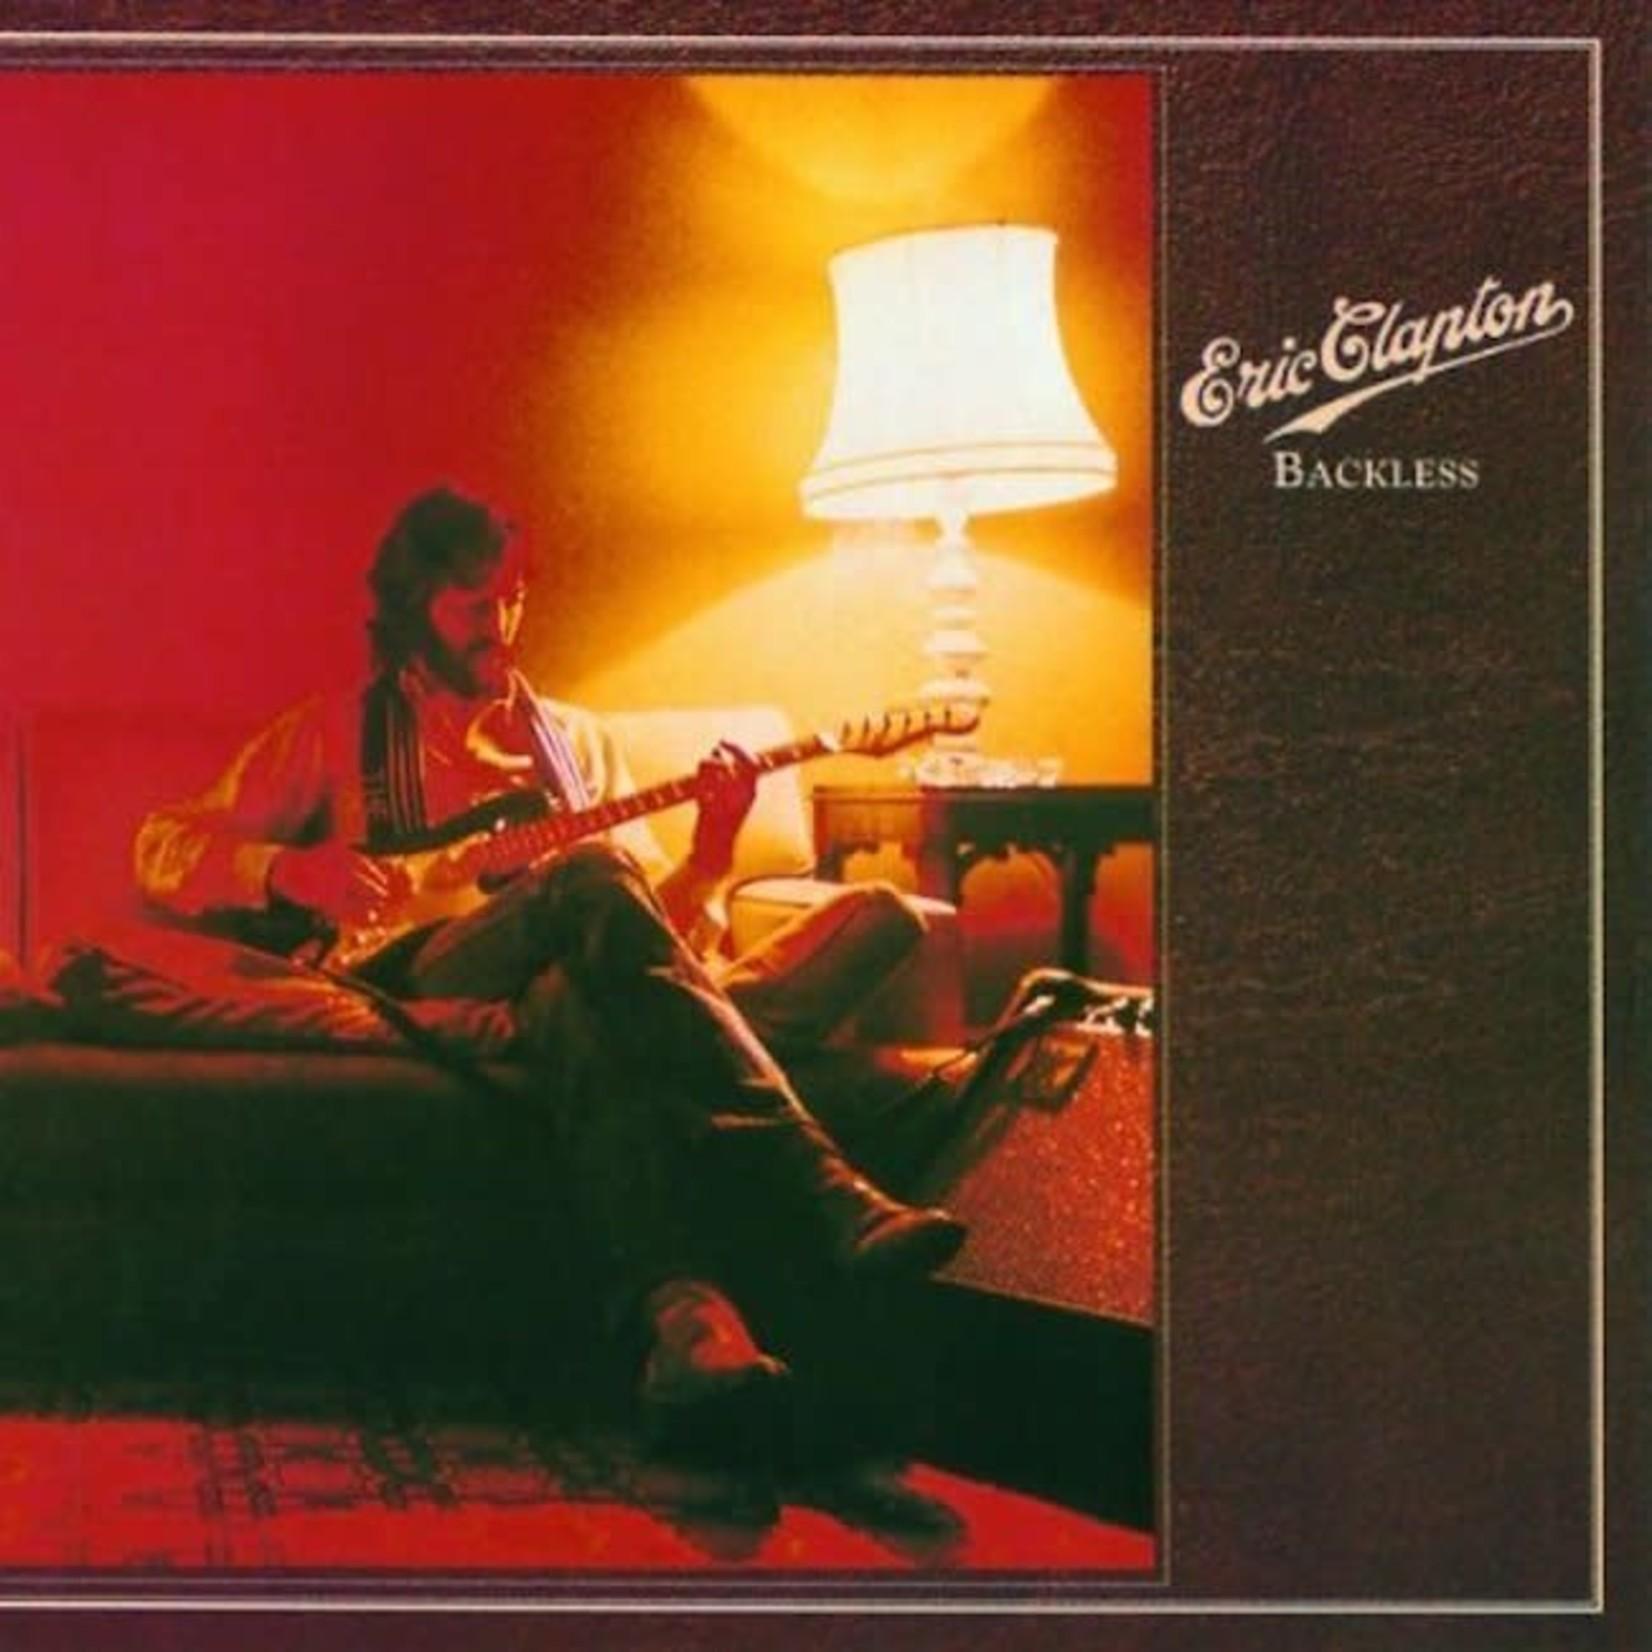 [Vintage] Clapton, Eric: Backless